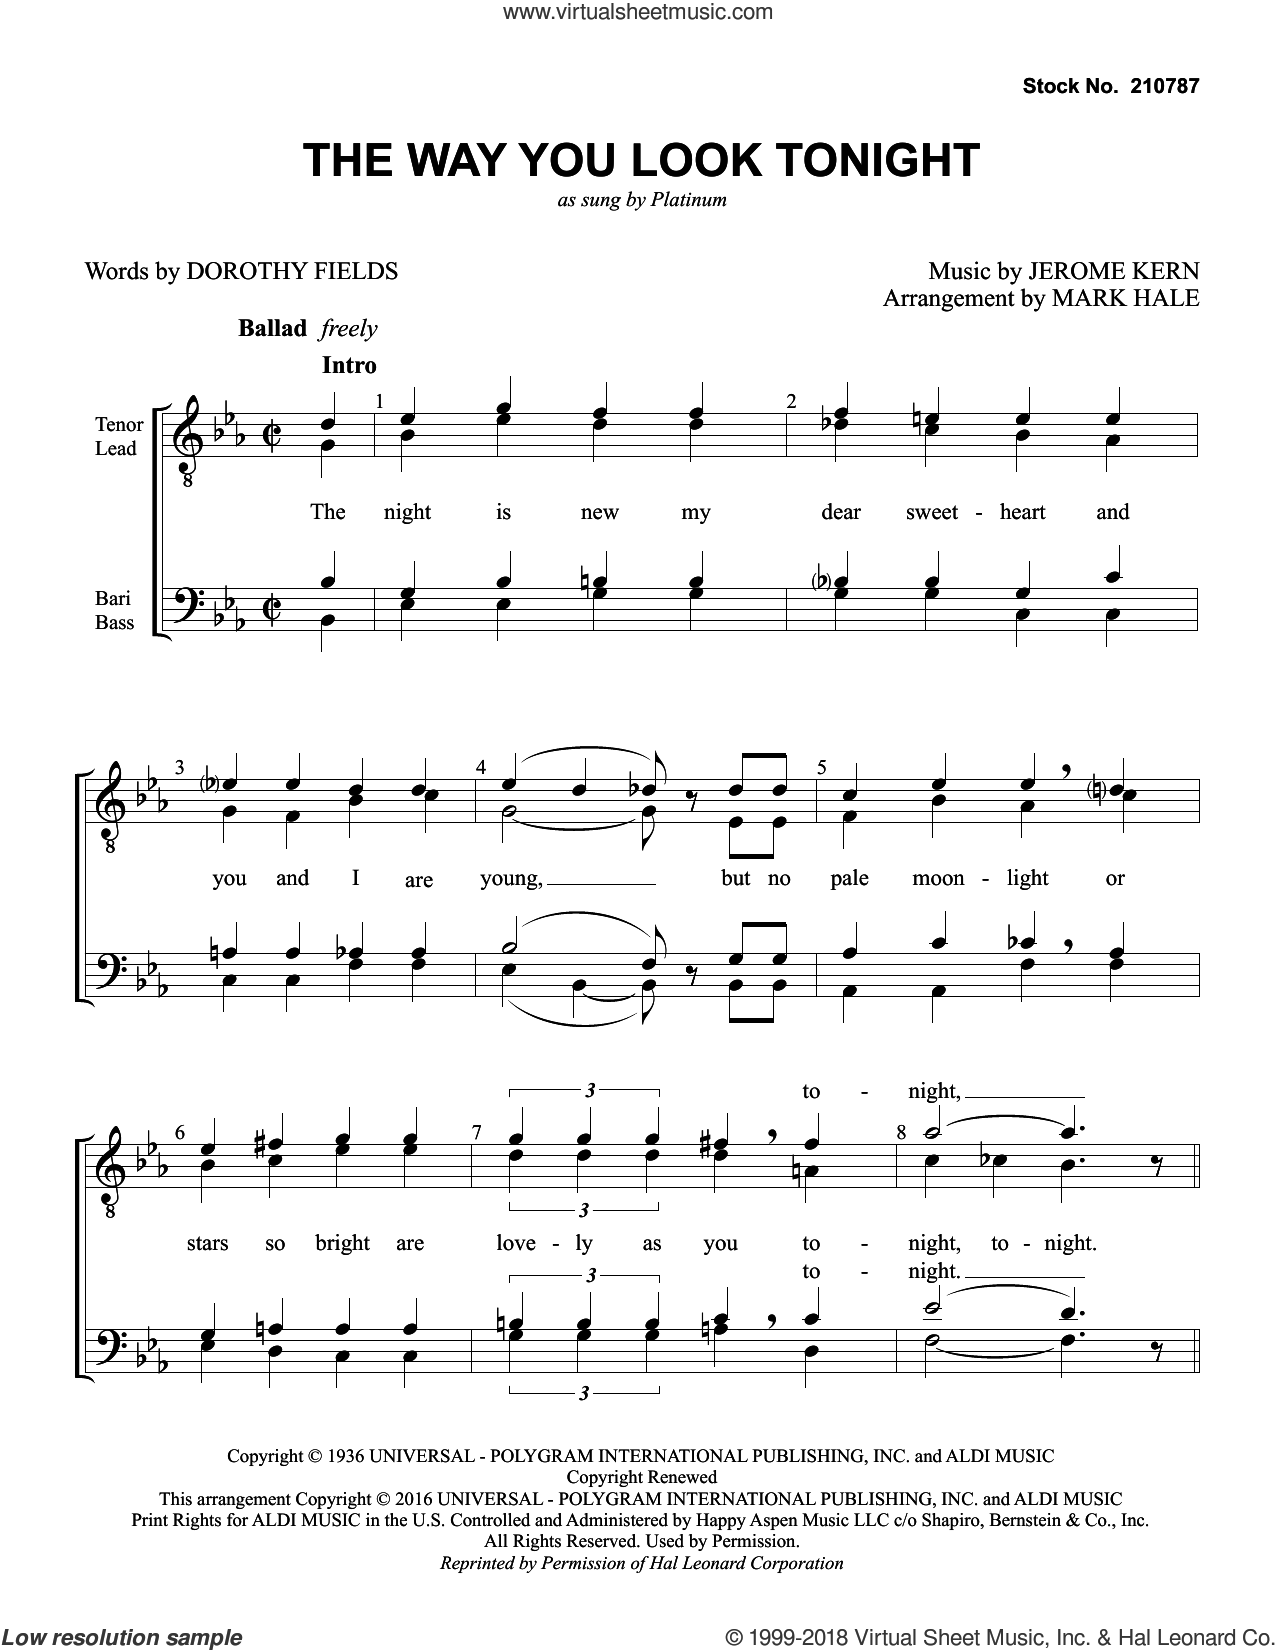 The Way You Look Tonight (arr. Mark Hale) sheet music for choir (TTBB: tenor, bass) by Platinum, Mark Hale, Dorothy Fields and Jerome Kern, intermediate skill level